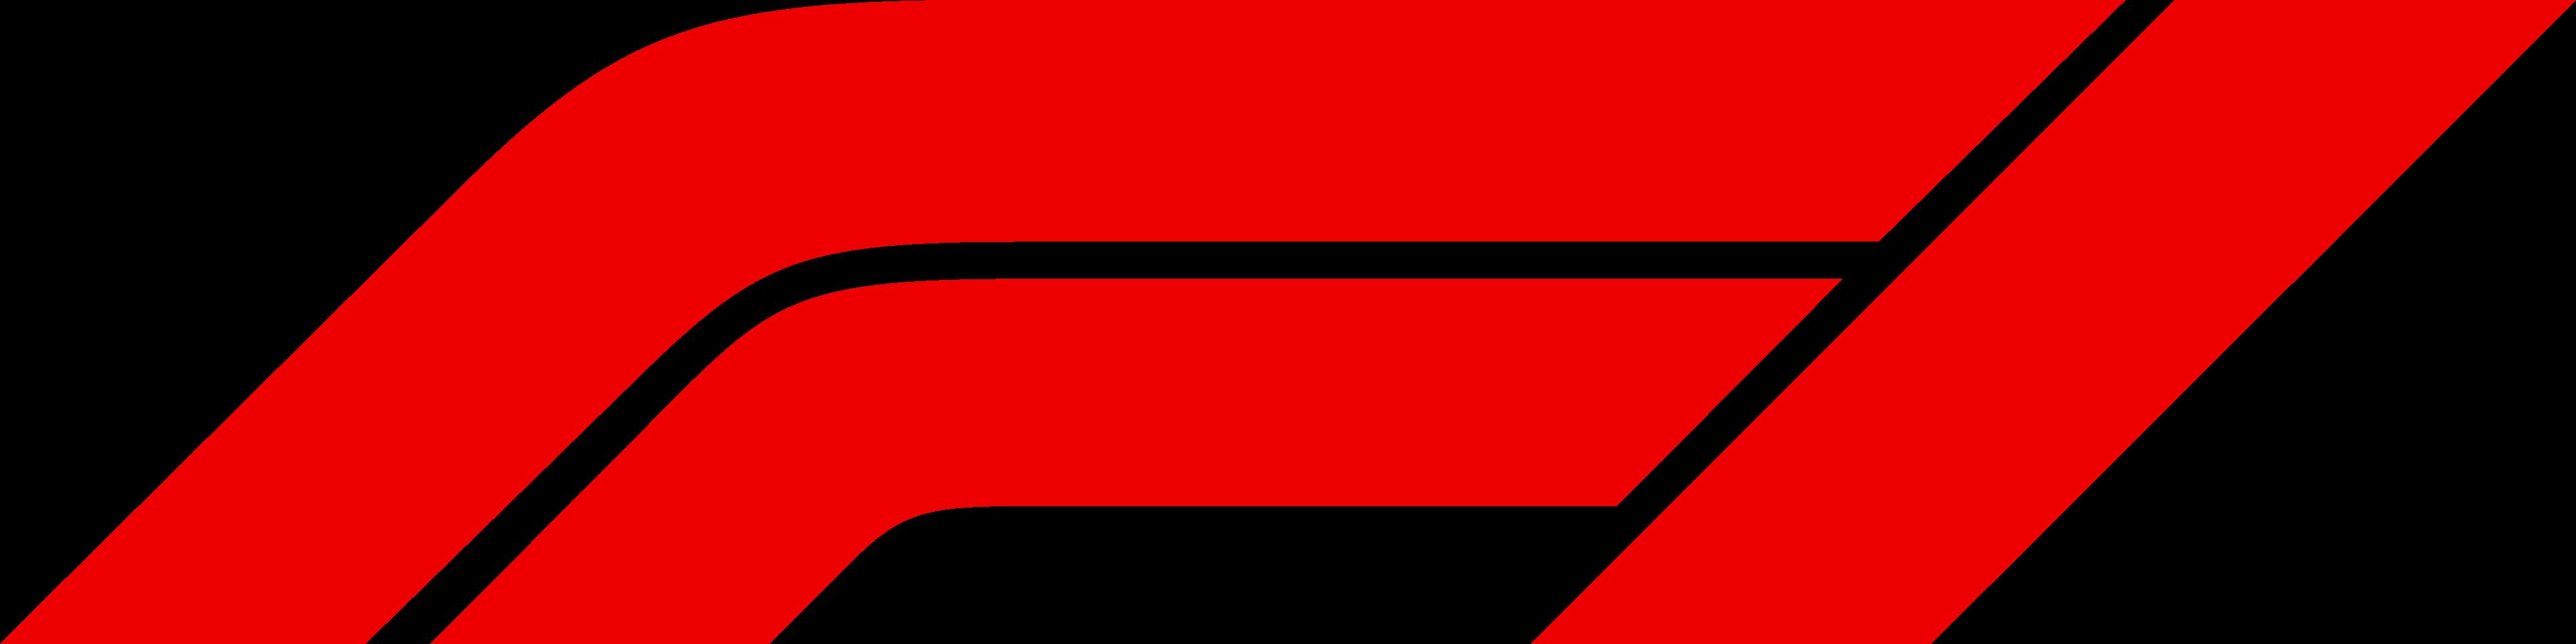 formula 1 logo 5 3 - Formula 1 Logo - F1 Logo